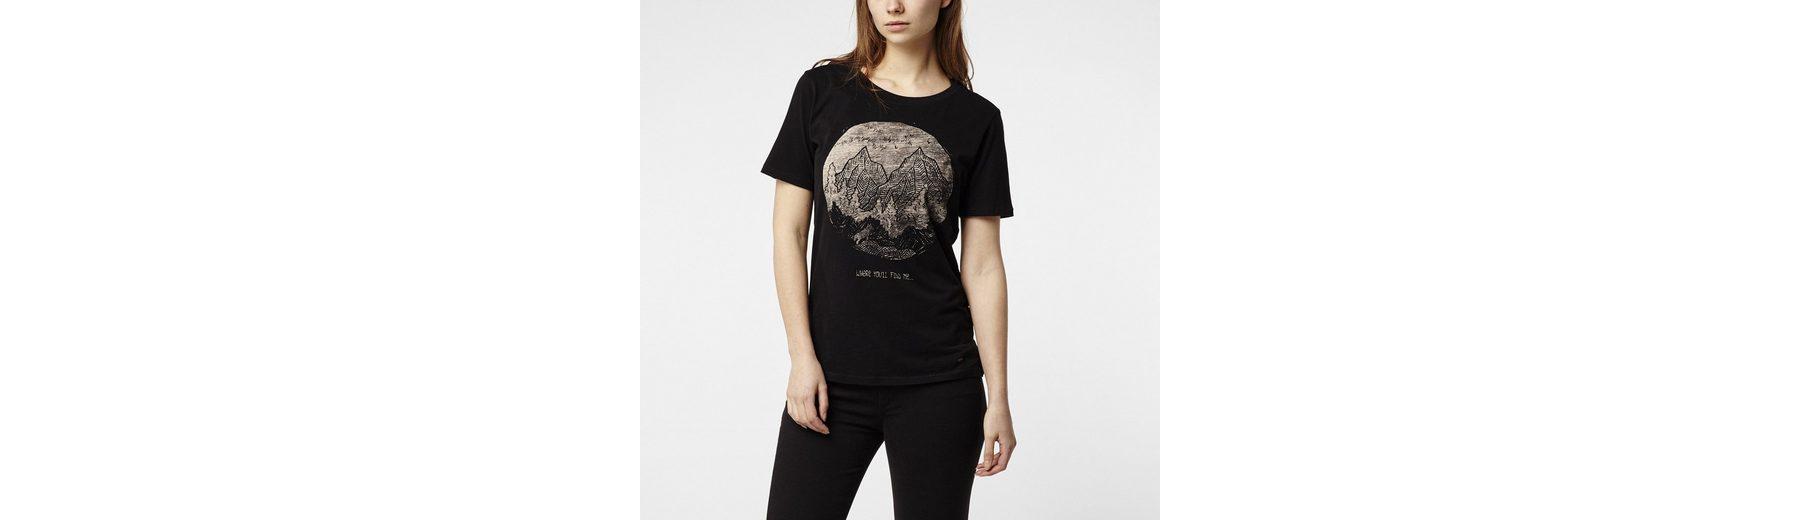 T kurz Shirt rmlig Americana Neill O Neill O q4TUtt